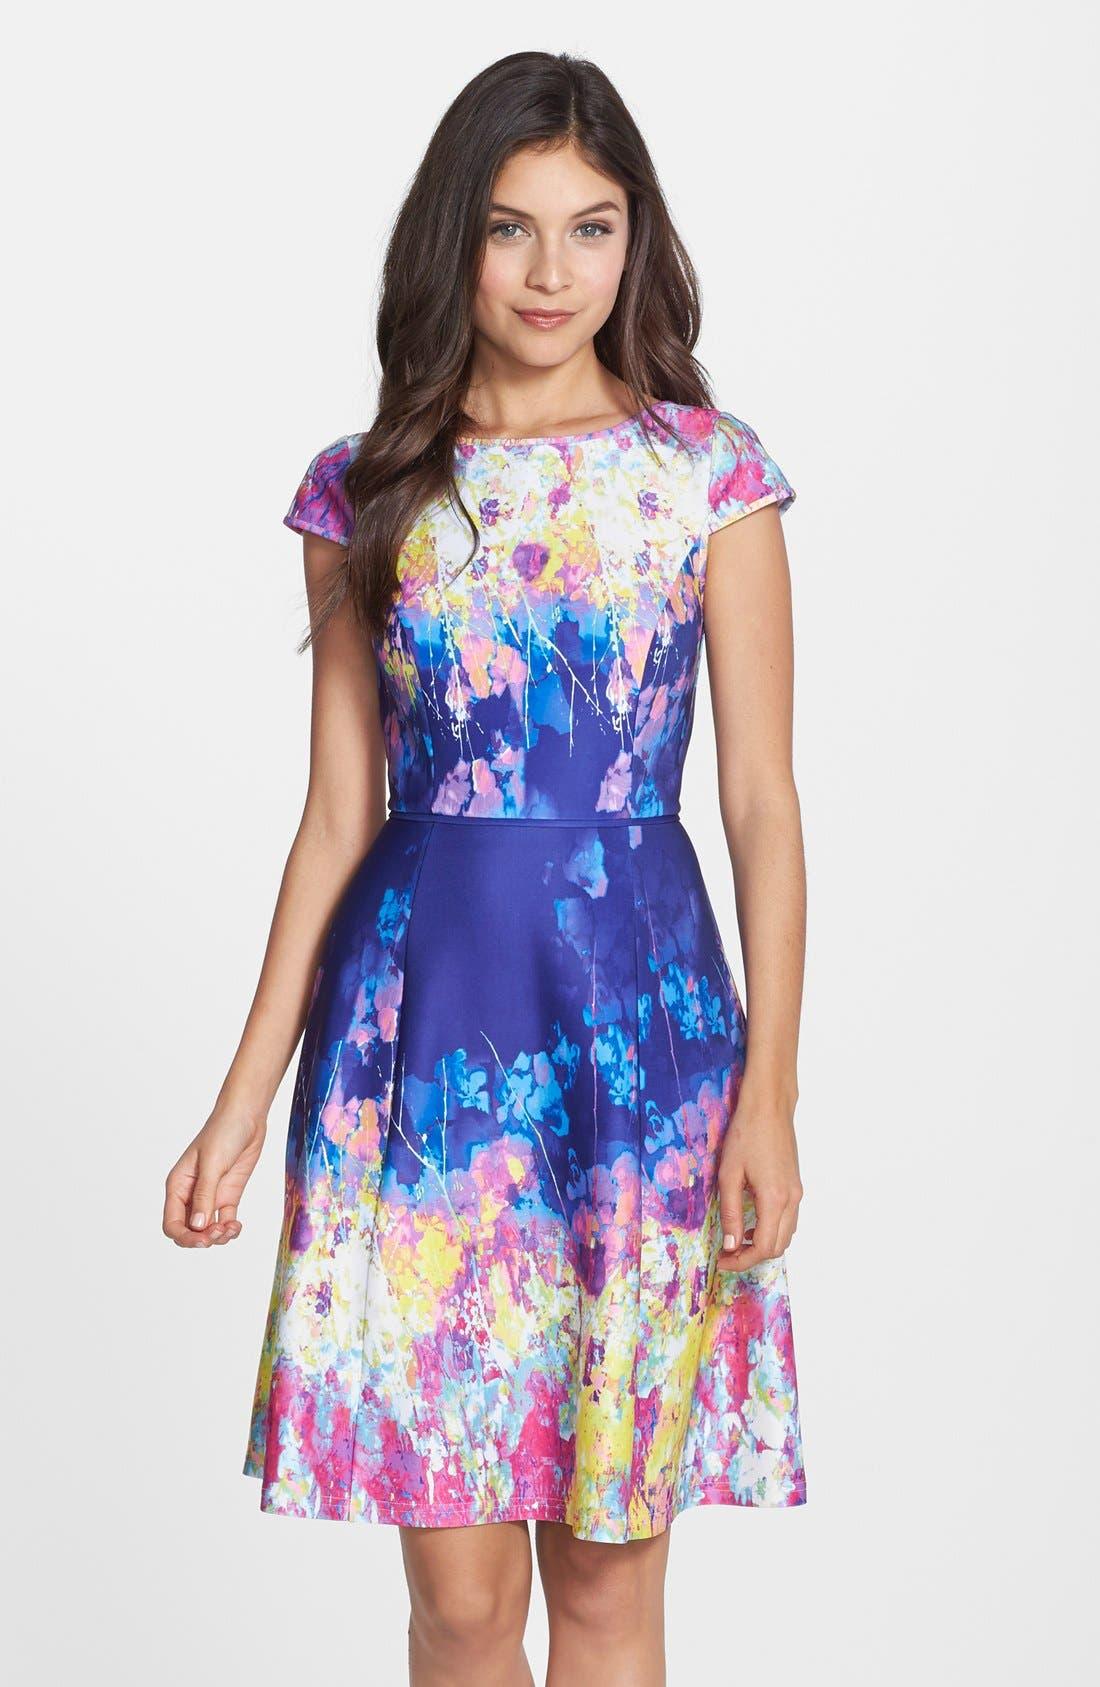 Alternate Image 1 Selected - Adrianna Papell Floral Print Scuba Fit & Flare Dress (Regular & Petite)